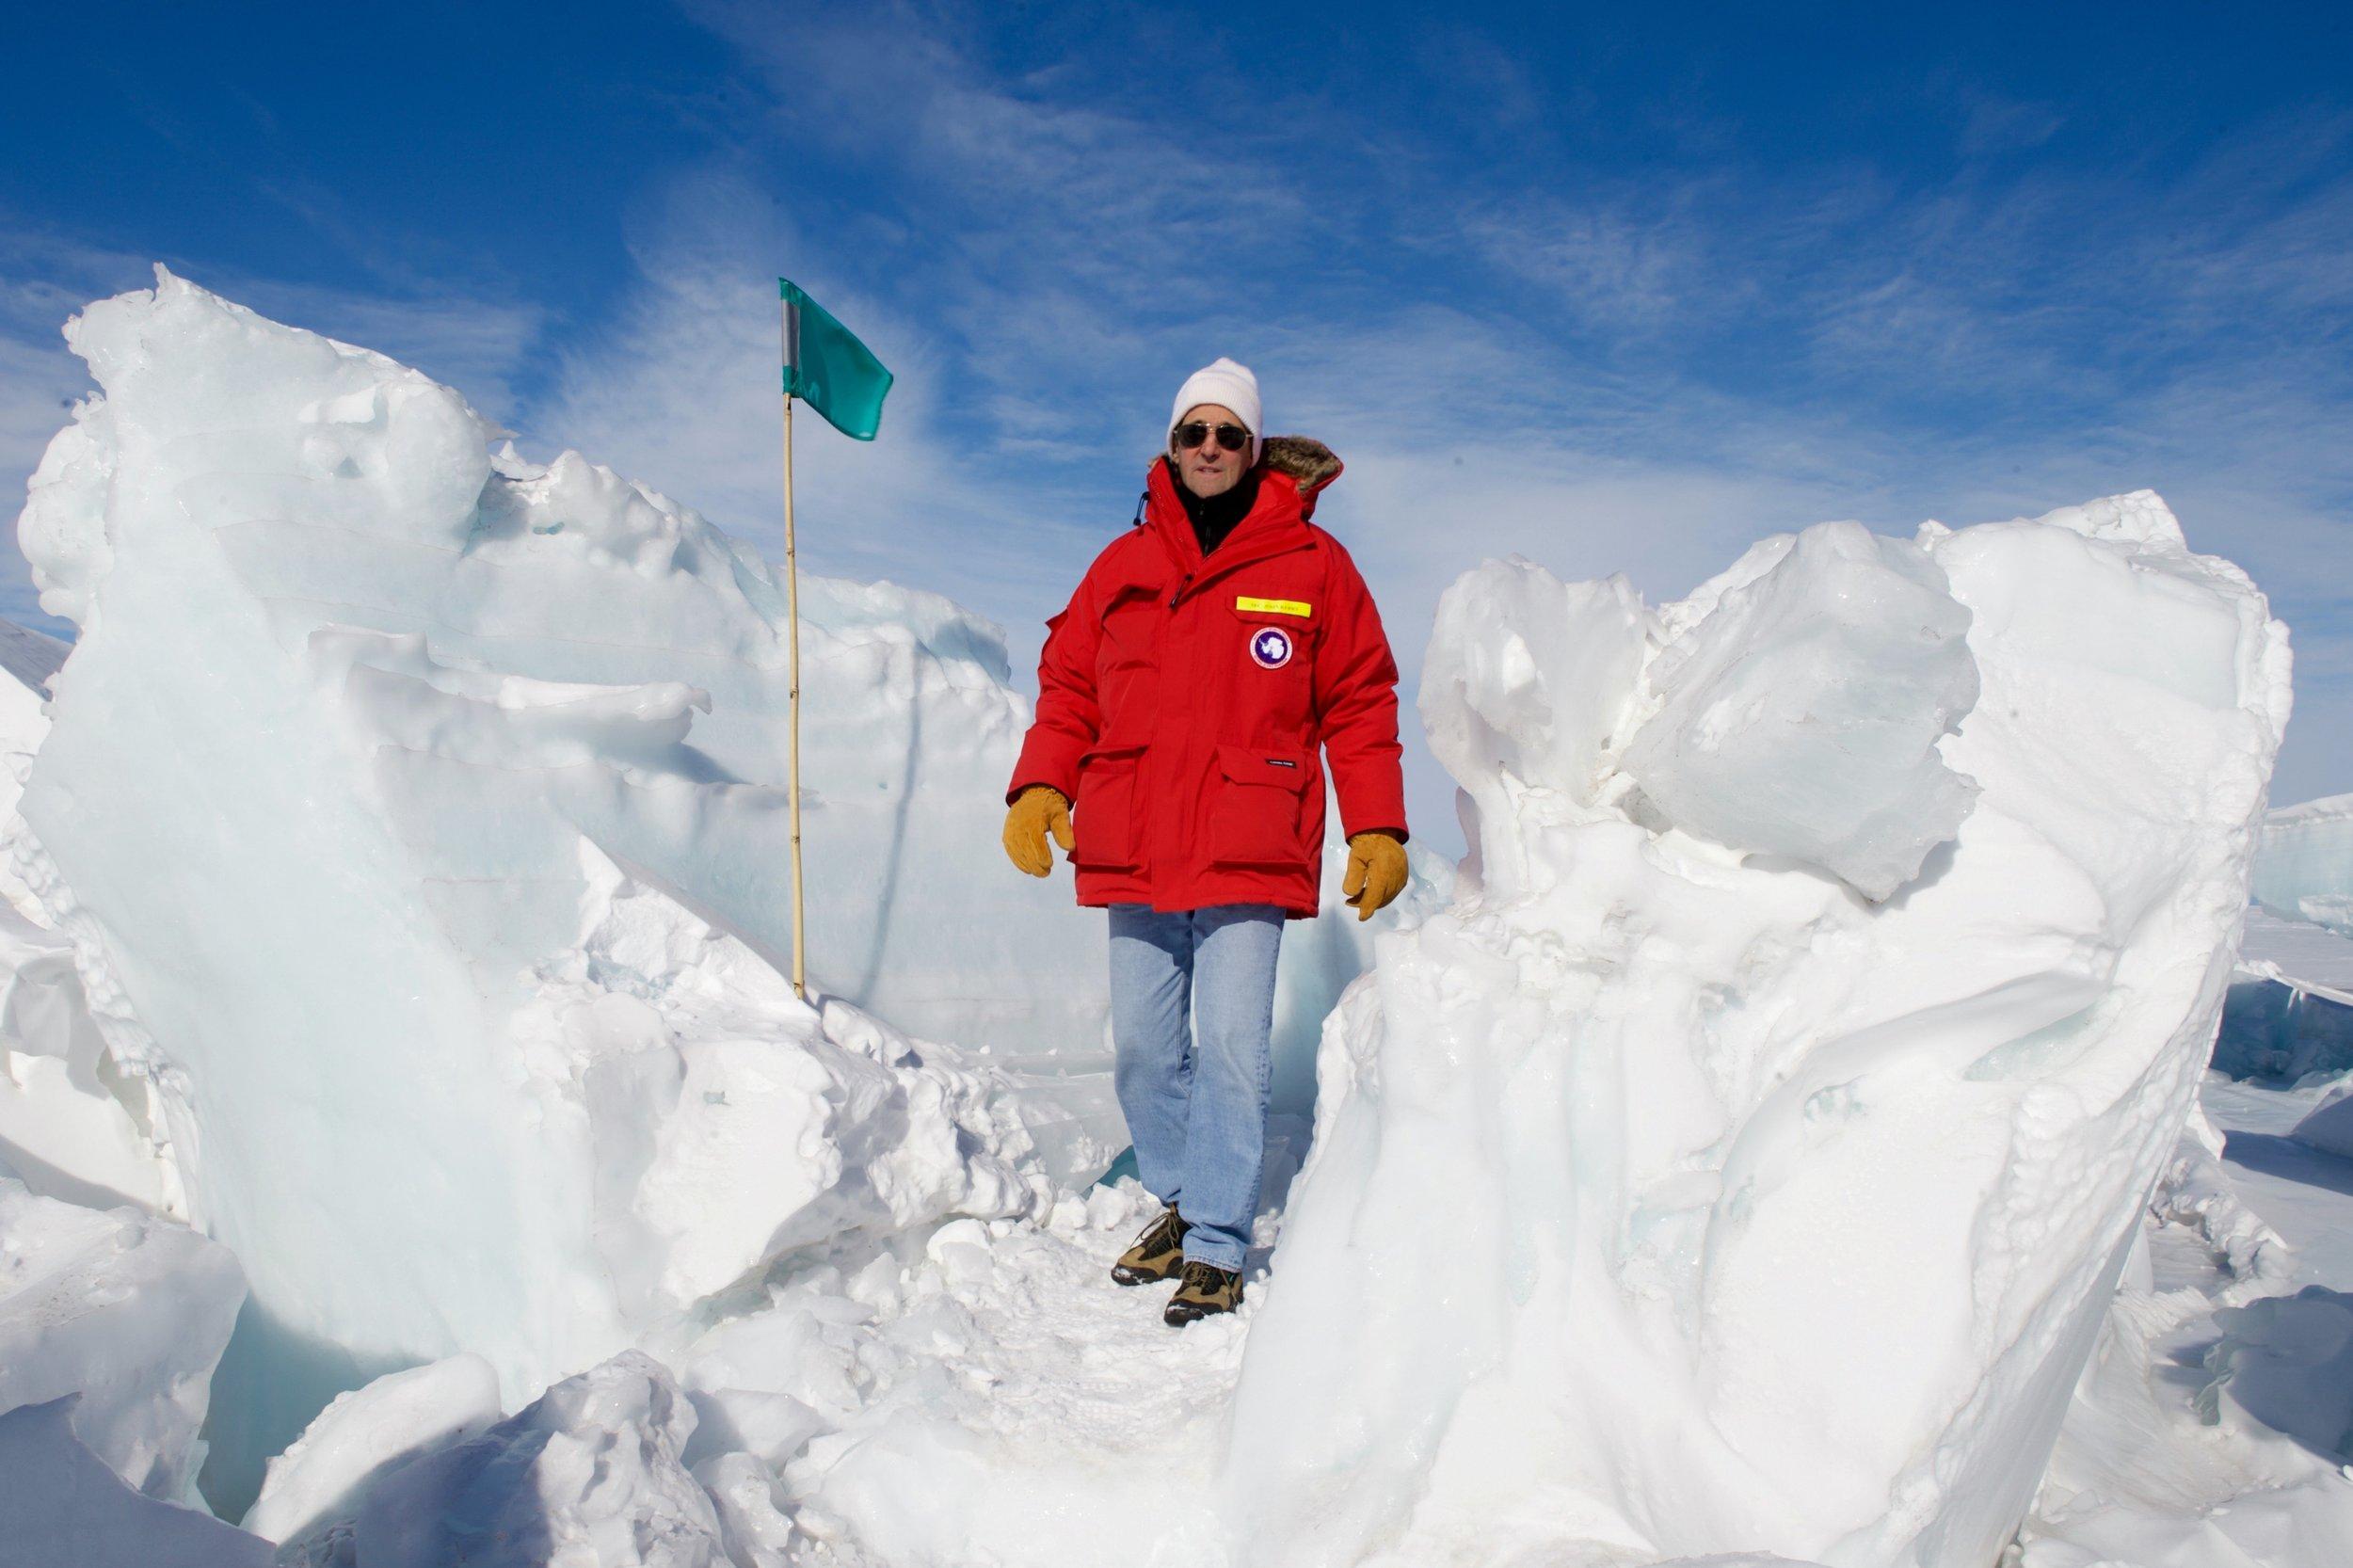 Secretary Kerry traversing a snow field near Scott Base after viewing seals in Antarctica.